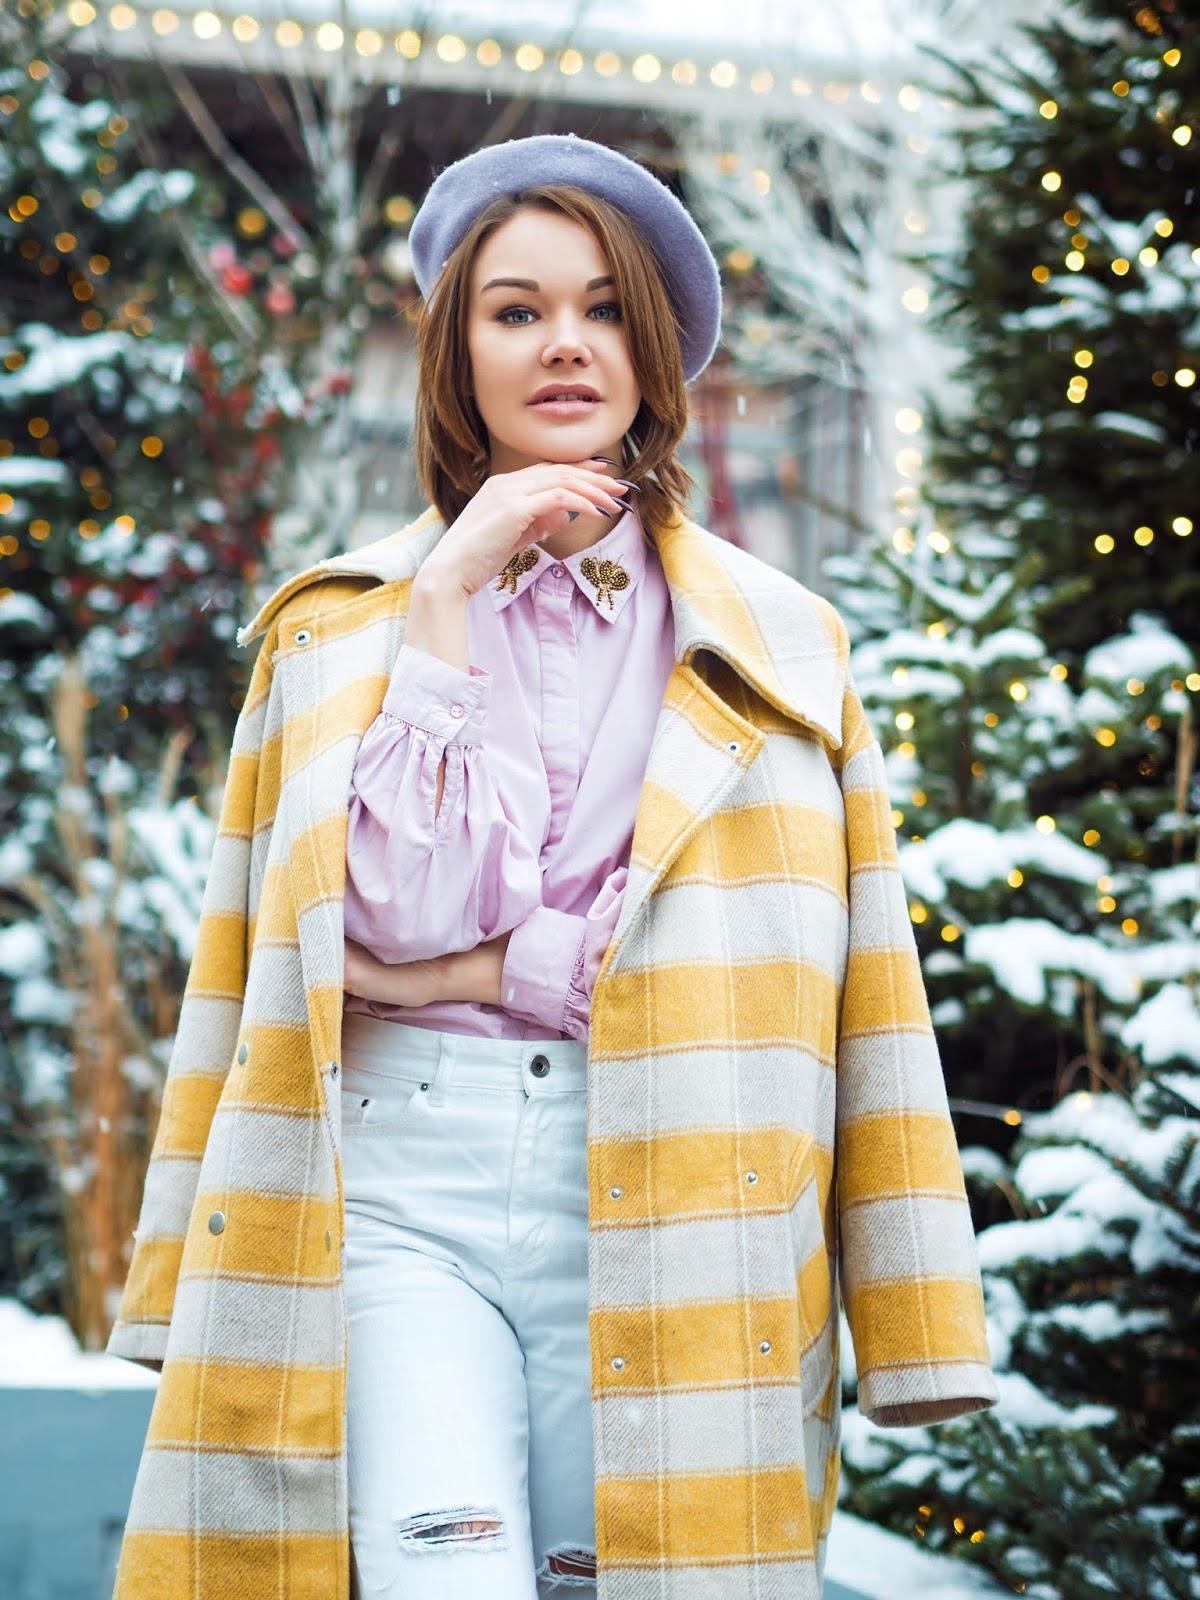 gvozdishe blogger coat shirt jeans shoes bag beret pink shirt winter outfits